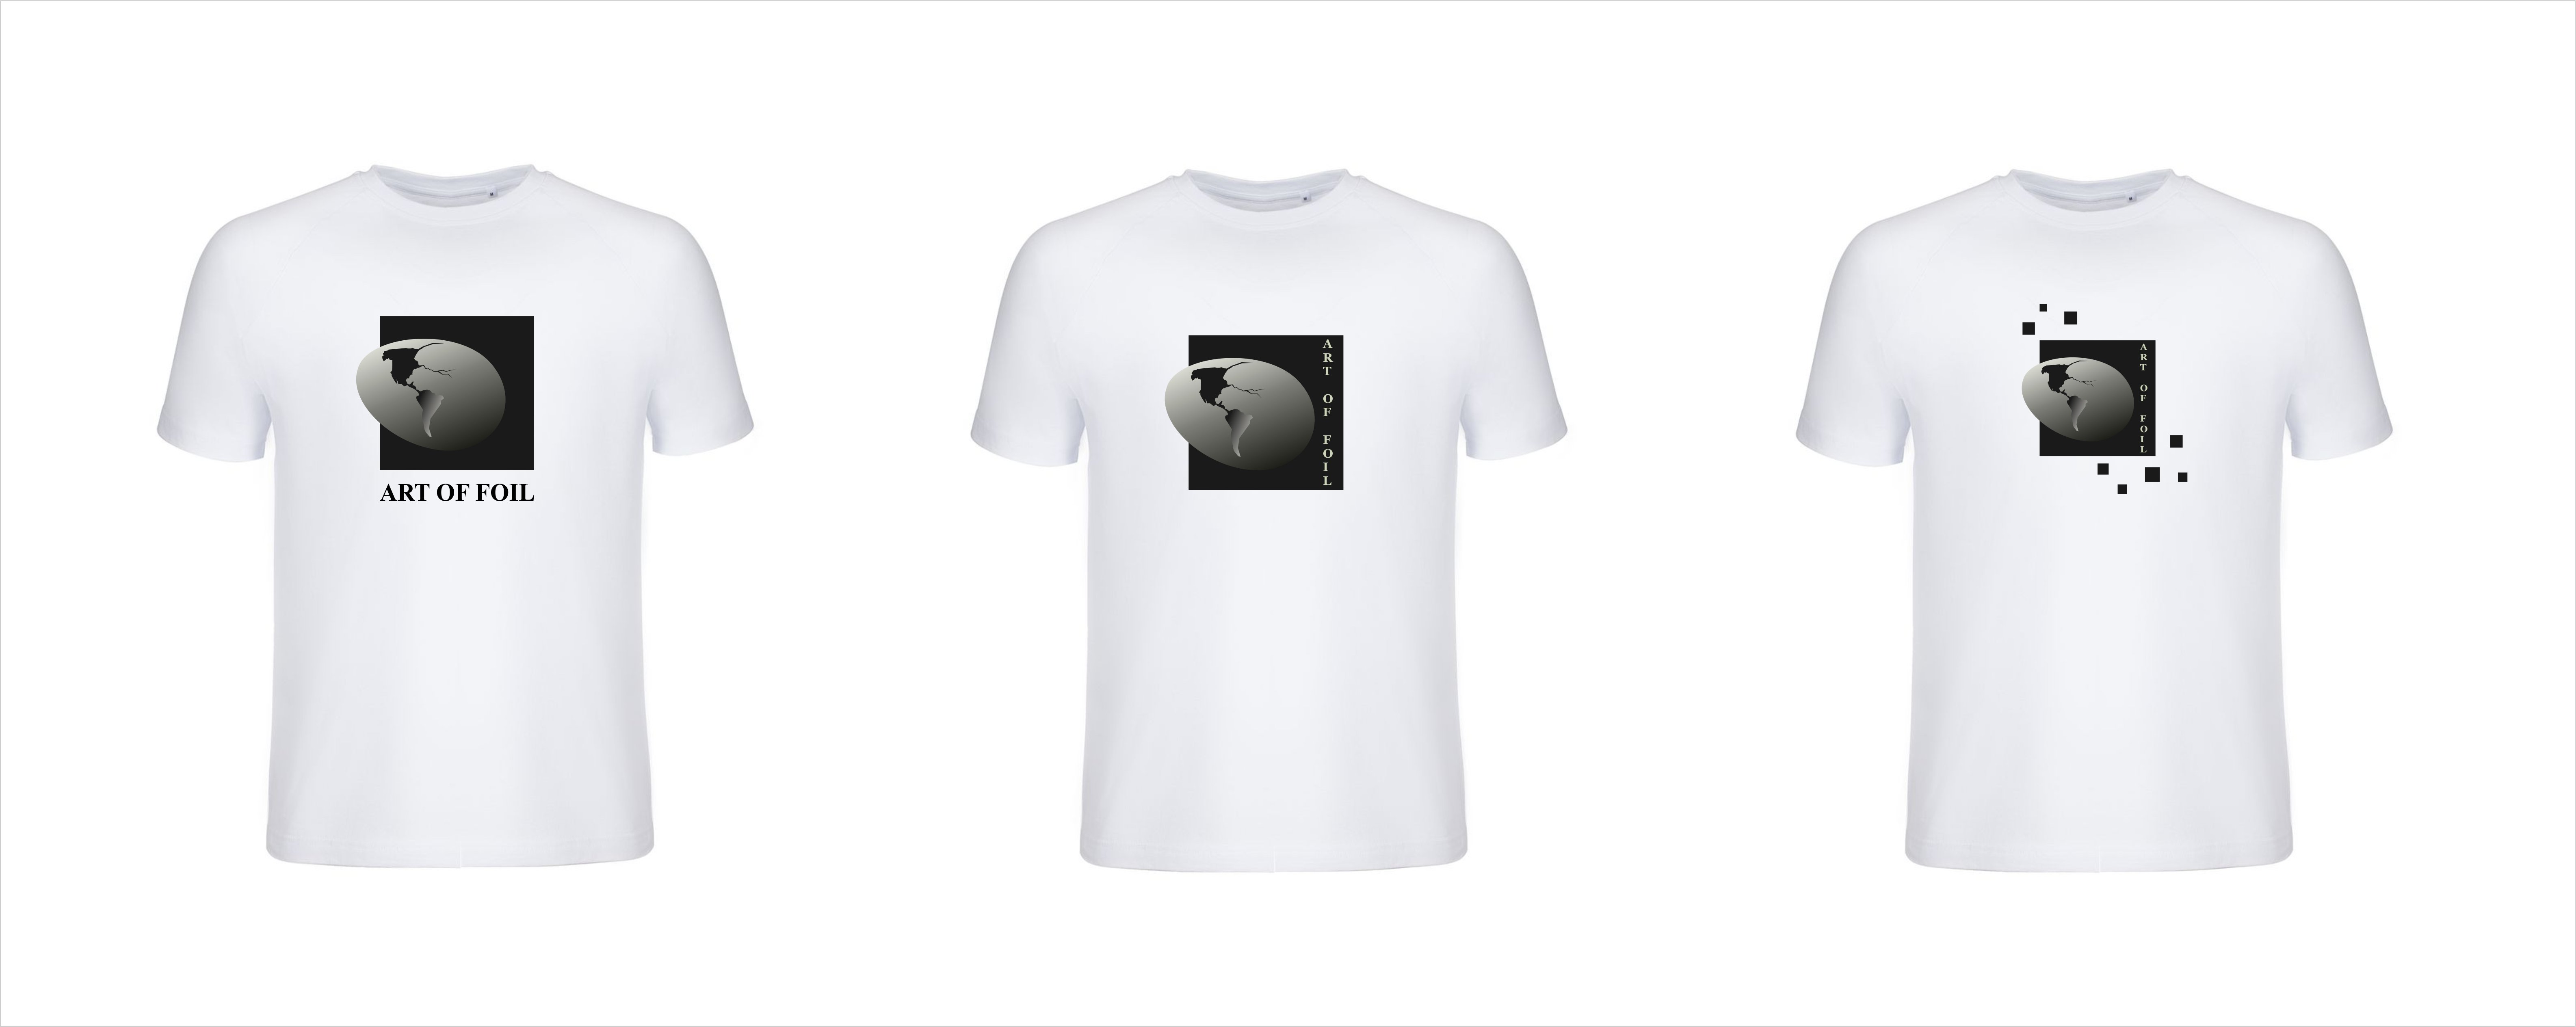 Разработать принт для футболки фото f_8825f68a9aaede5f.jpg